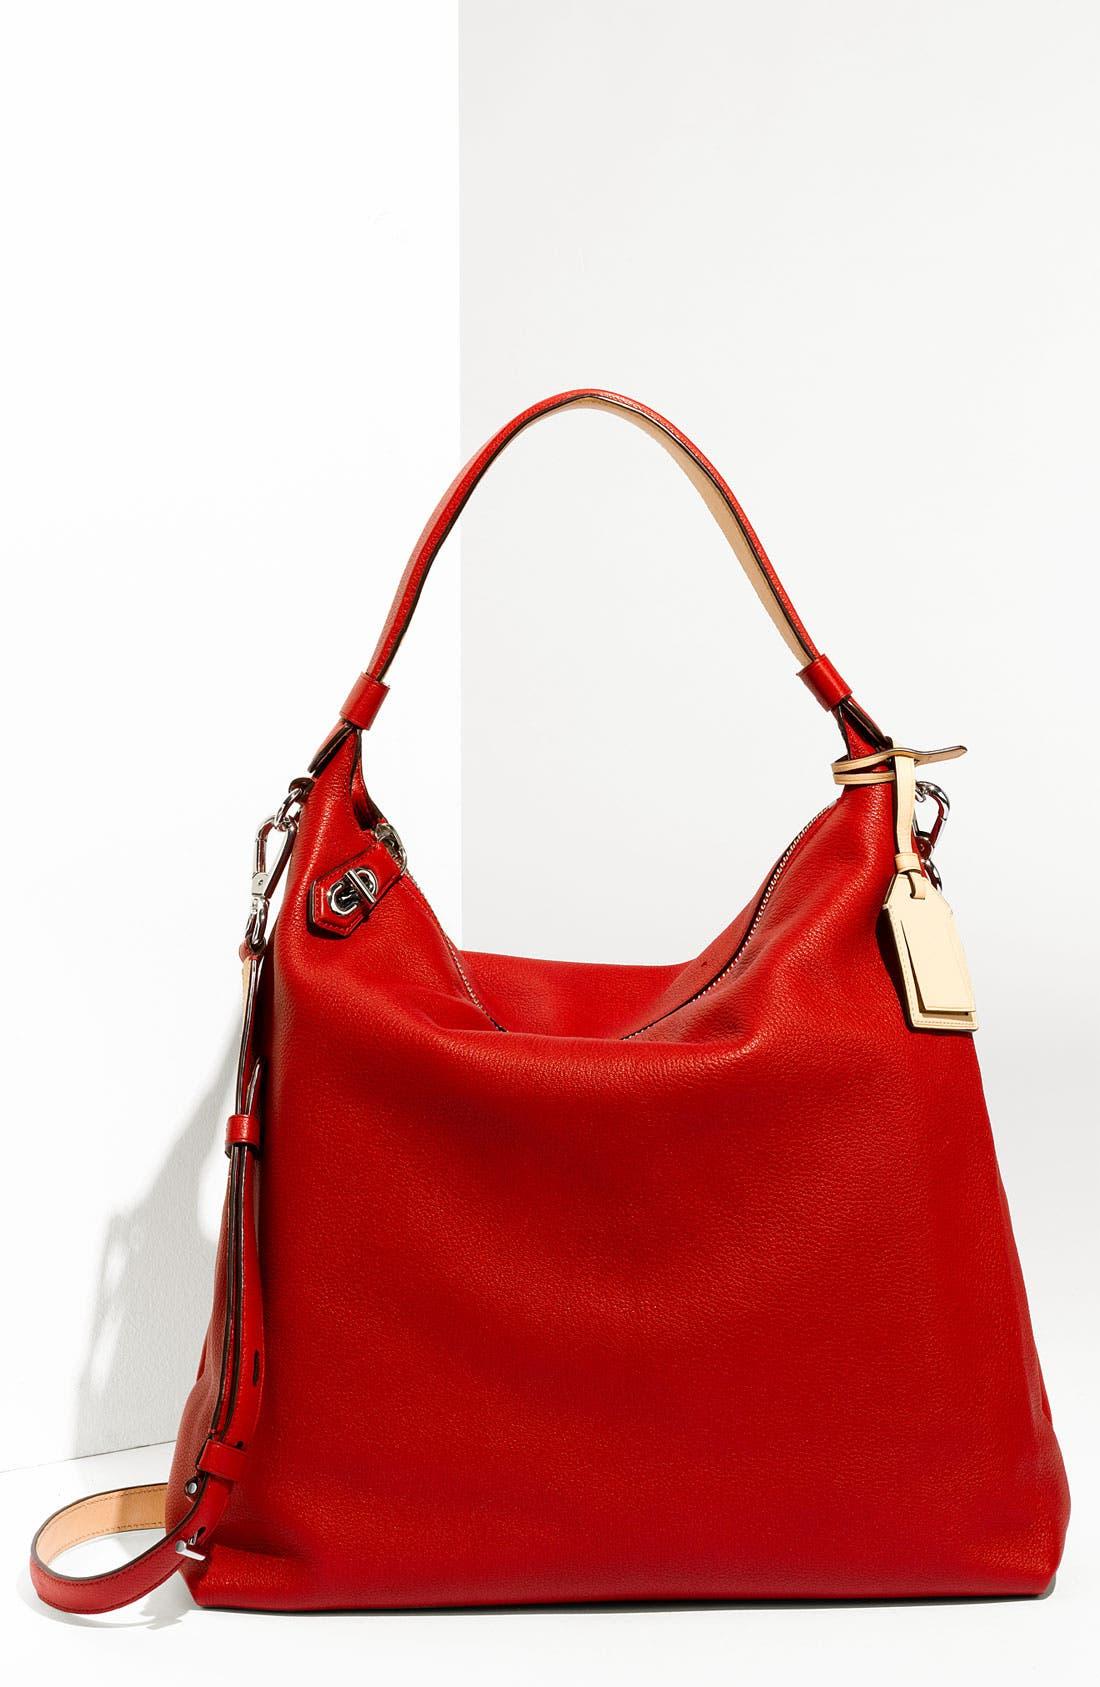 Main Image - Reed Krakoff 'Standard' Leather Hobo